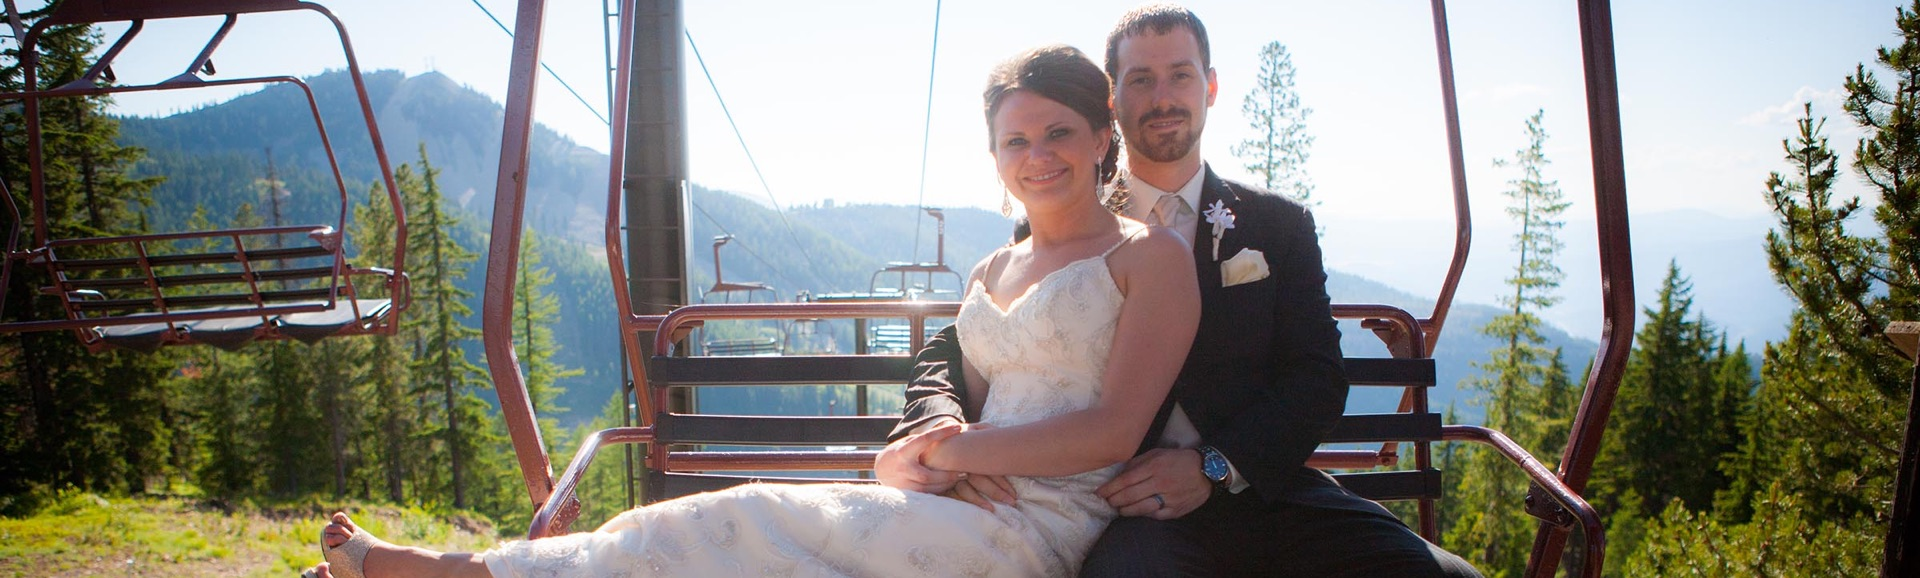 Weddings desktop image